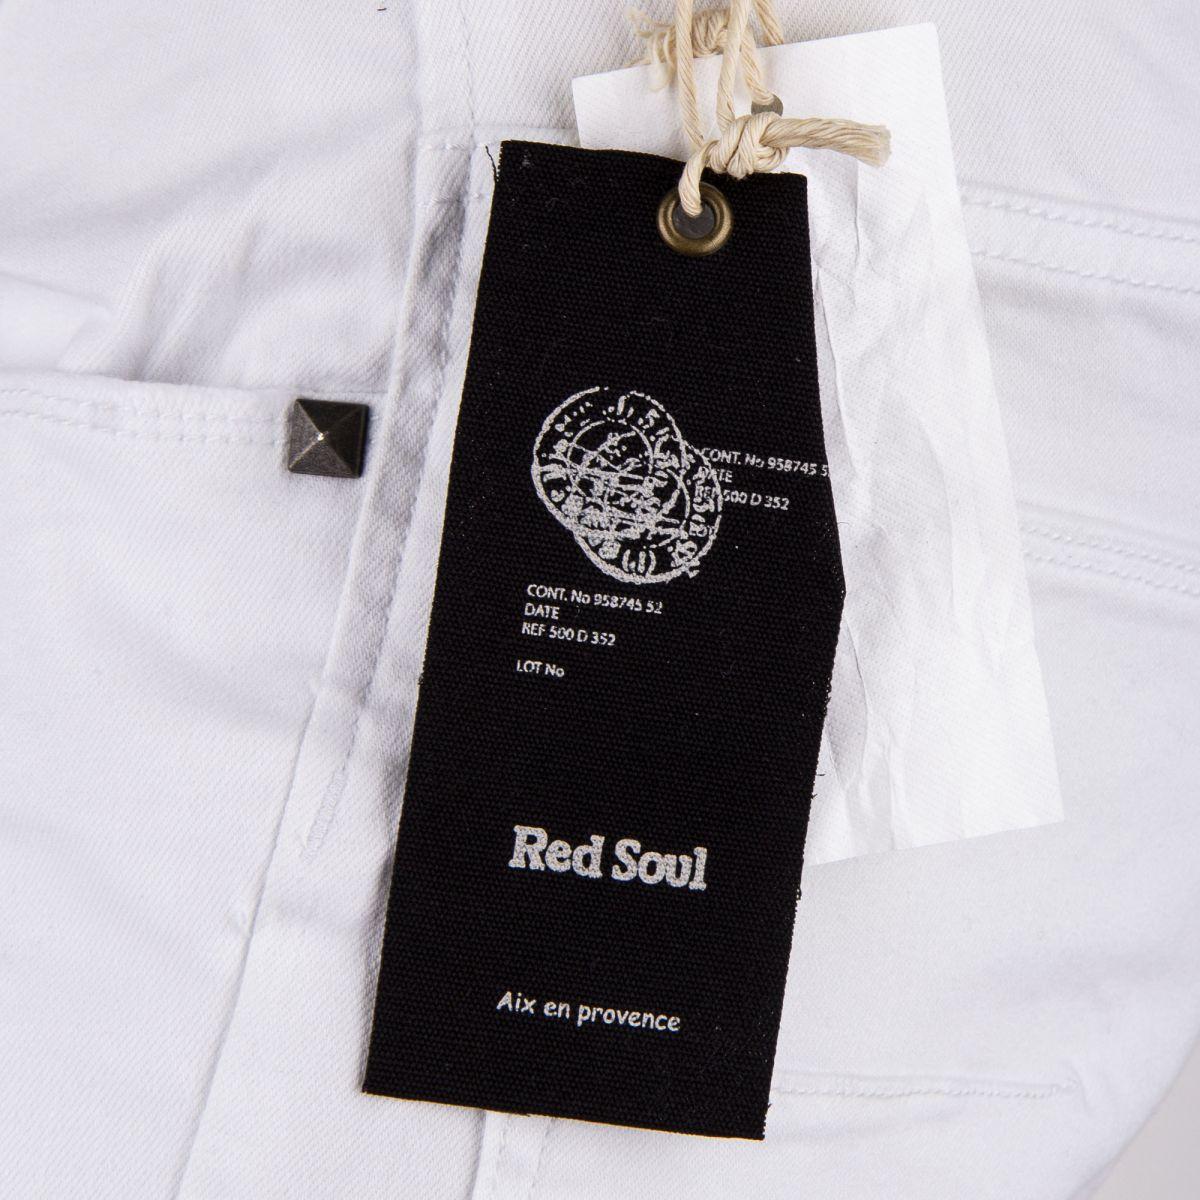 pantalon en toile blanc homme red soul prix d griff. Black Bedroom Furniture Sets. Home Design Ideas